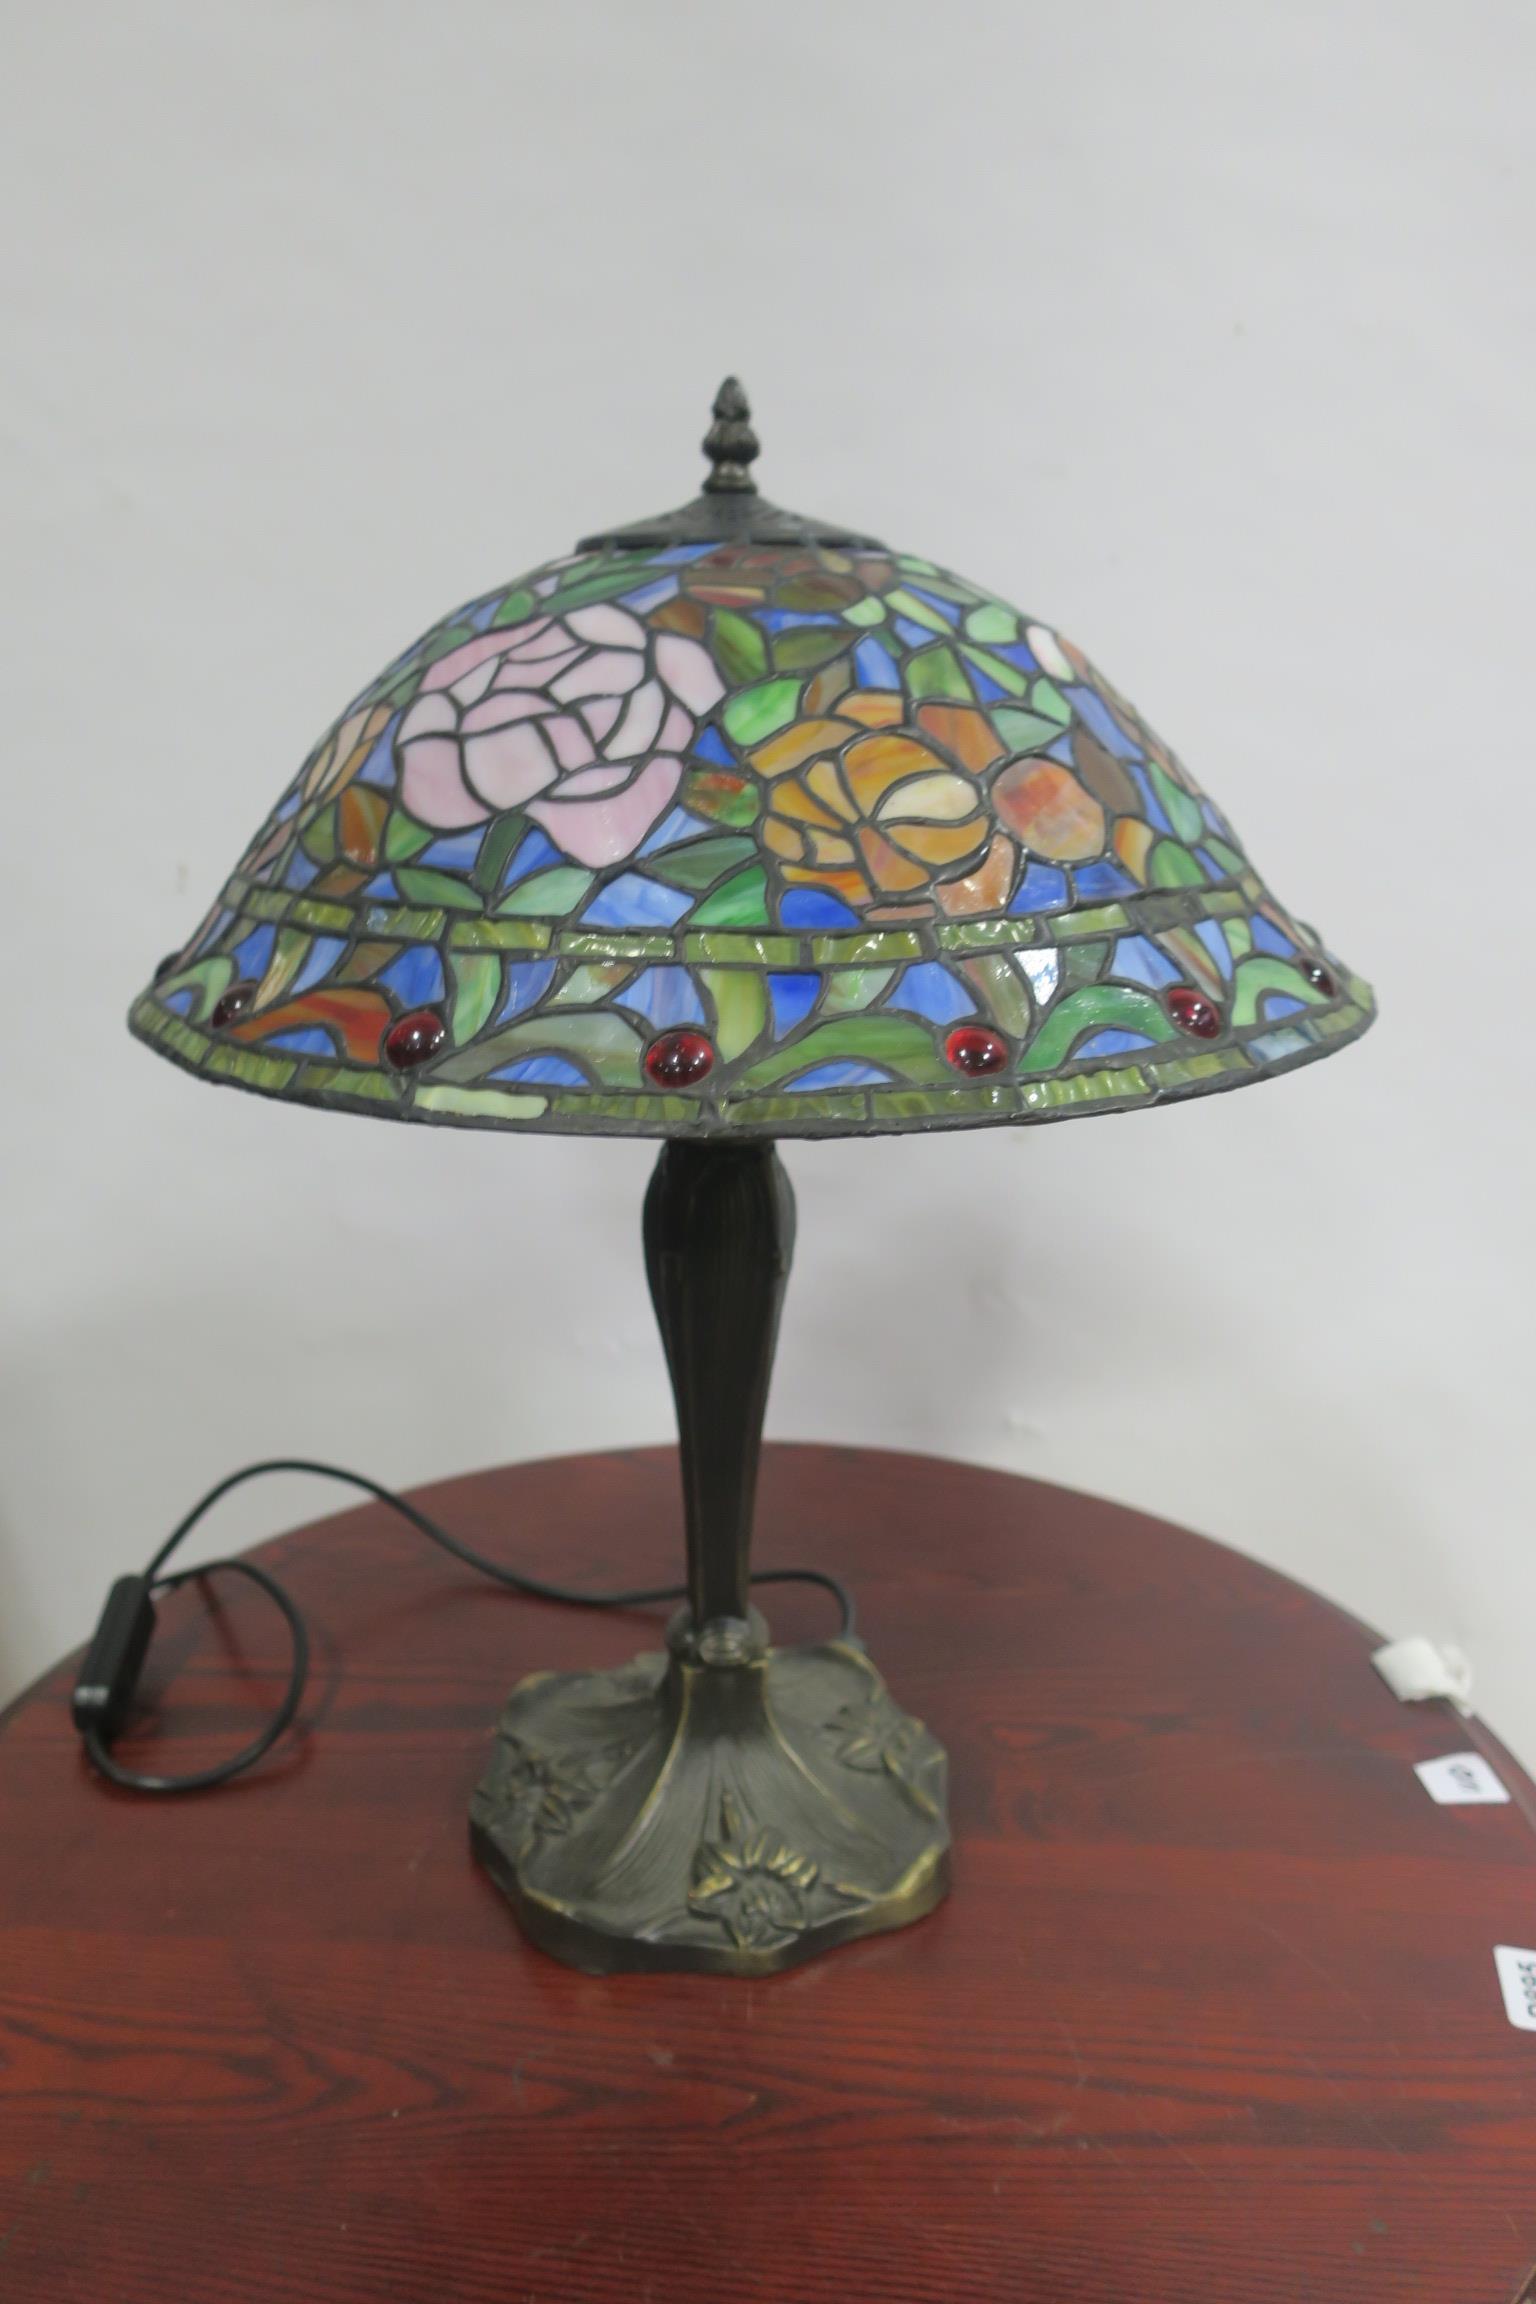 Lot 527 - A TIFFANY DESIGN TABLE LAMP,